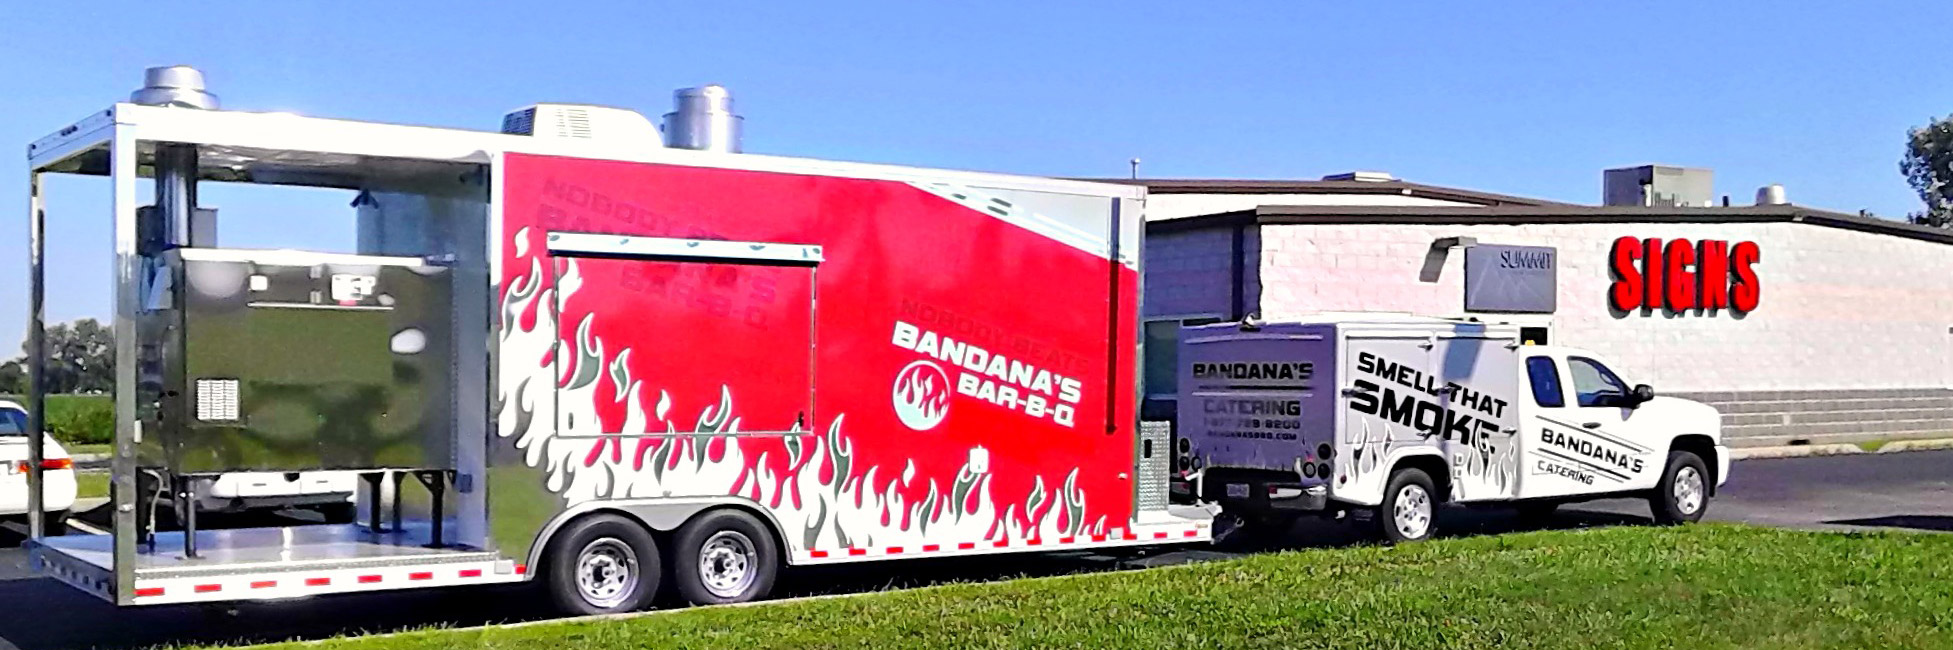 Bandana's Catering Truck